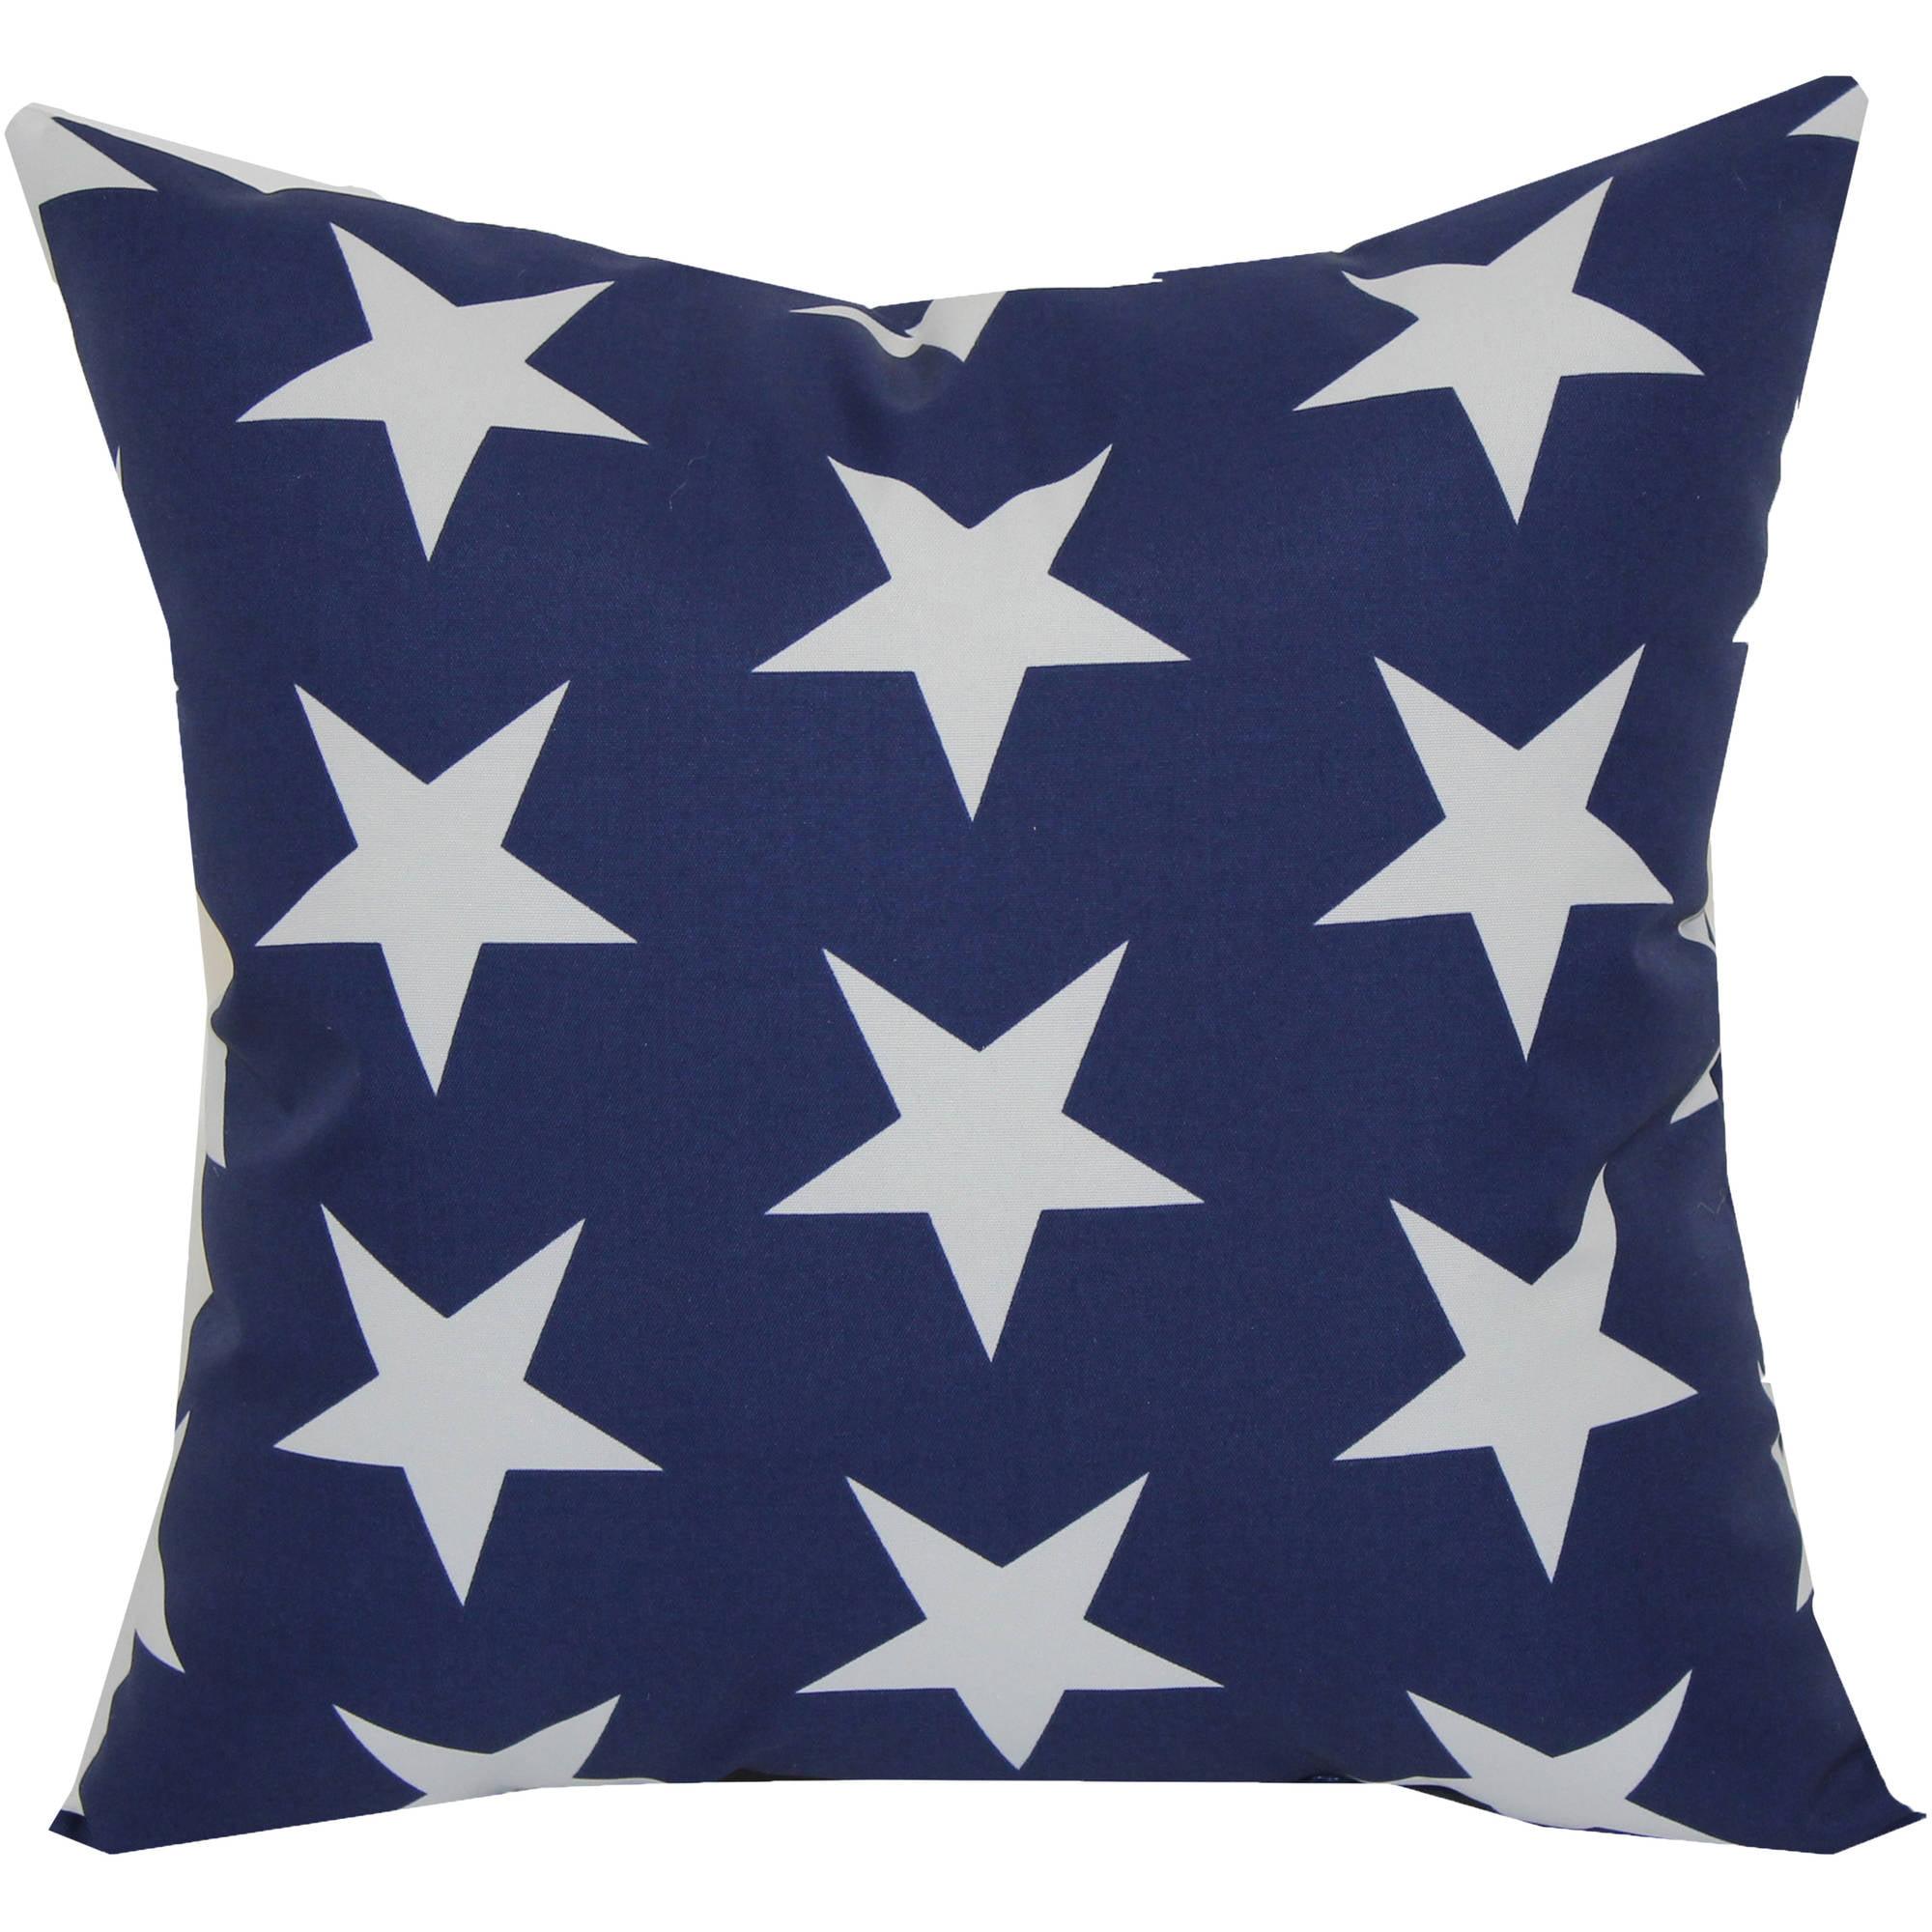 "Mainstays 16"" Stars Outdoor Pillow Walmart"